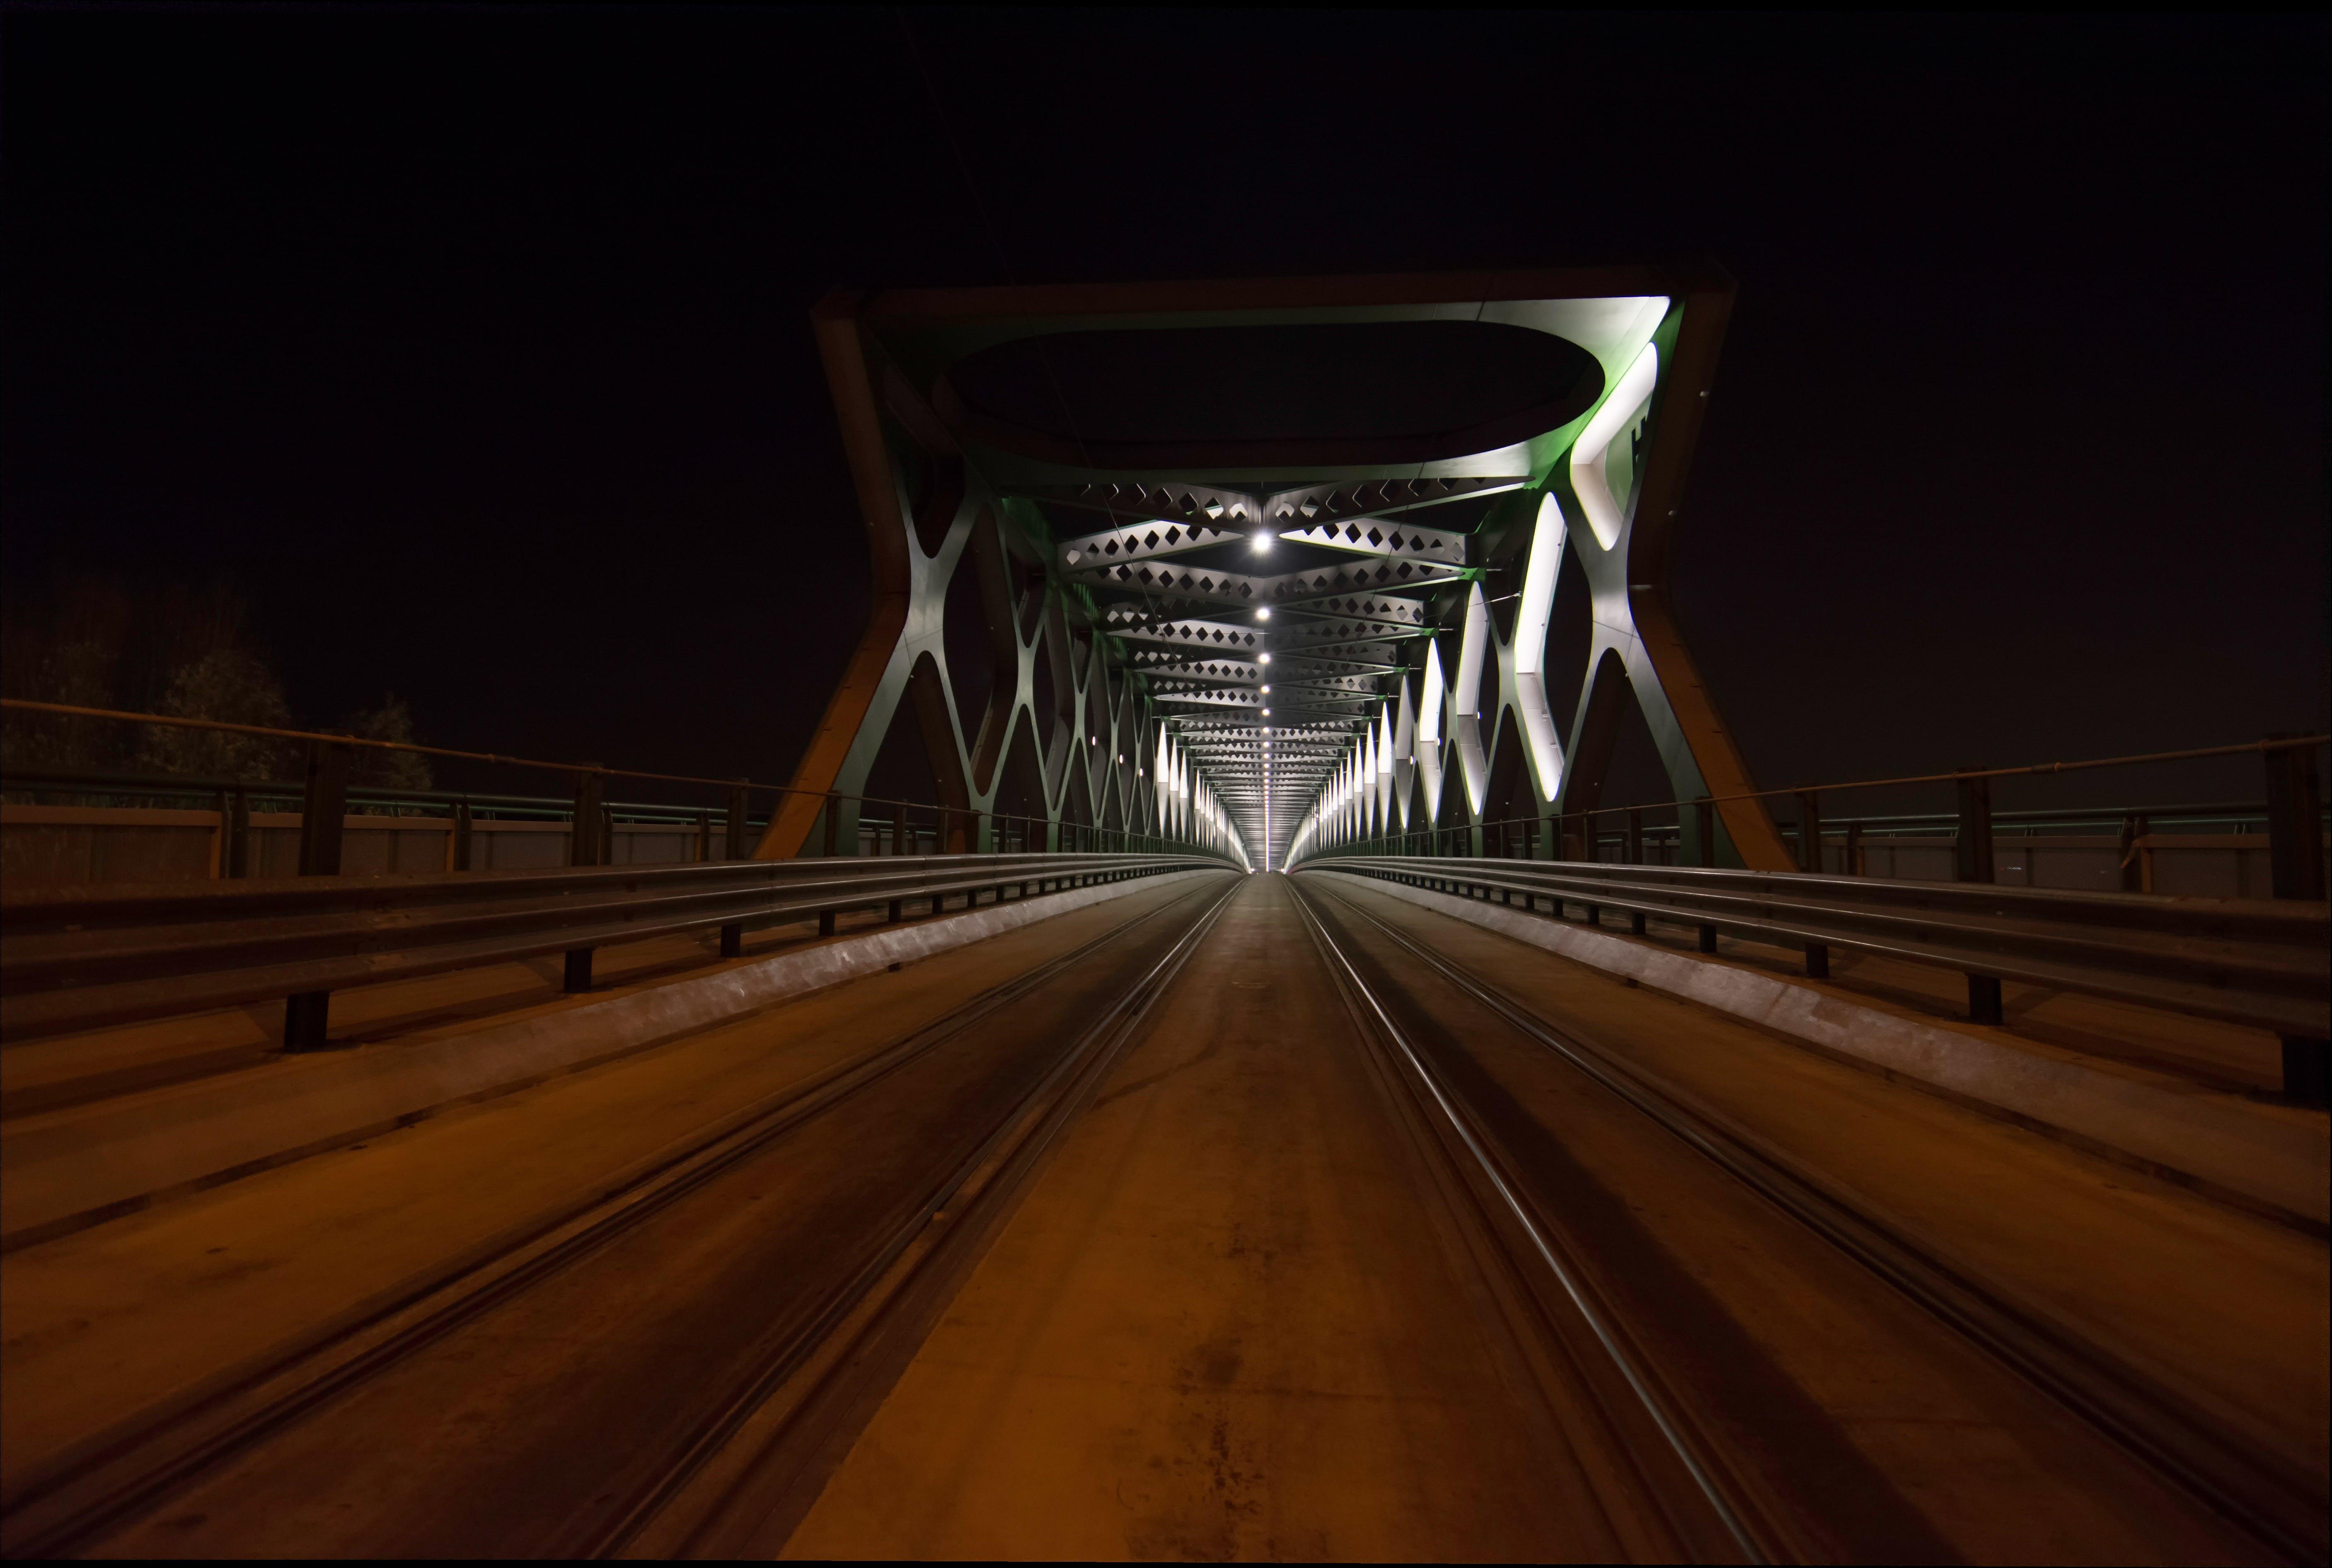 Free stock photo of architecture, bridge, night photography